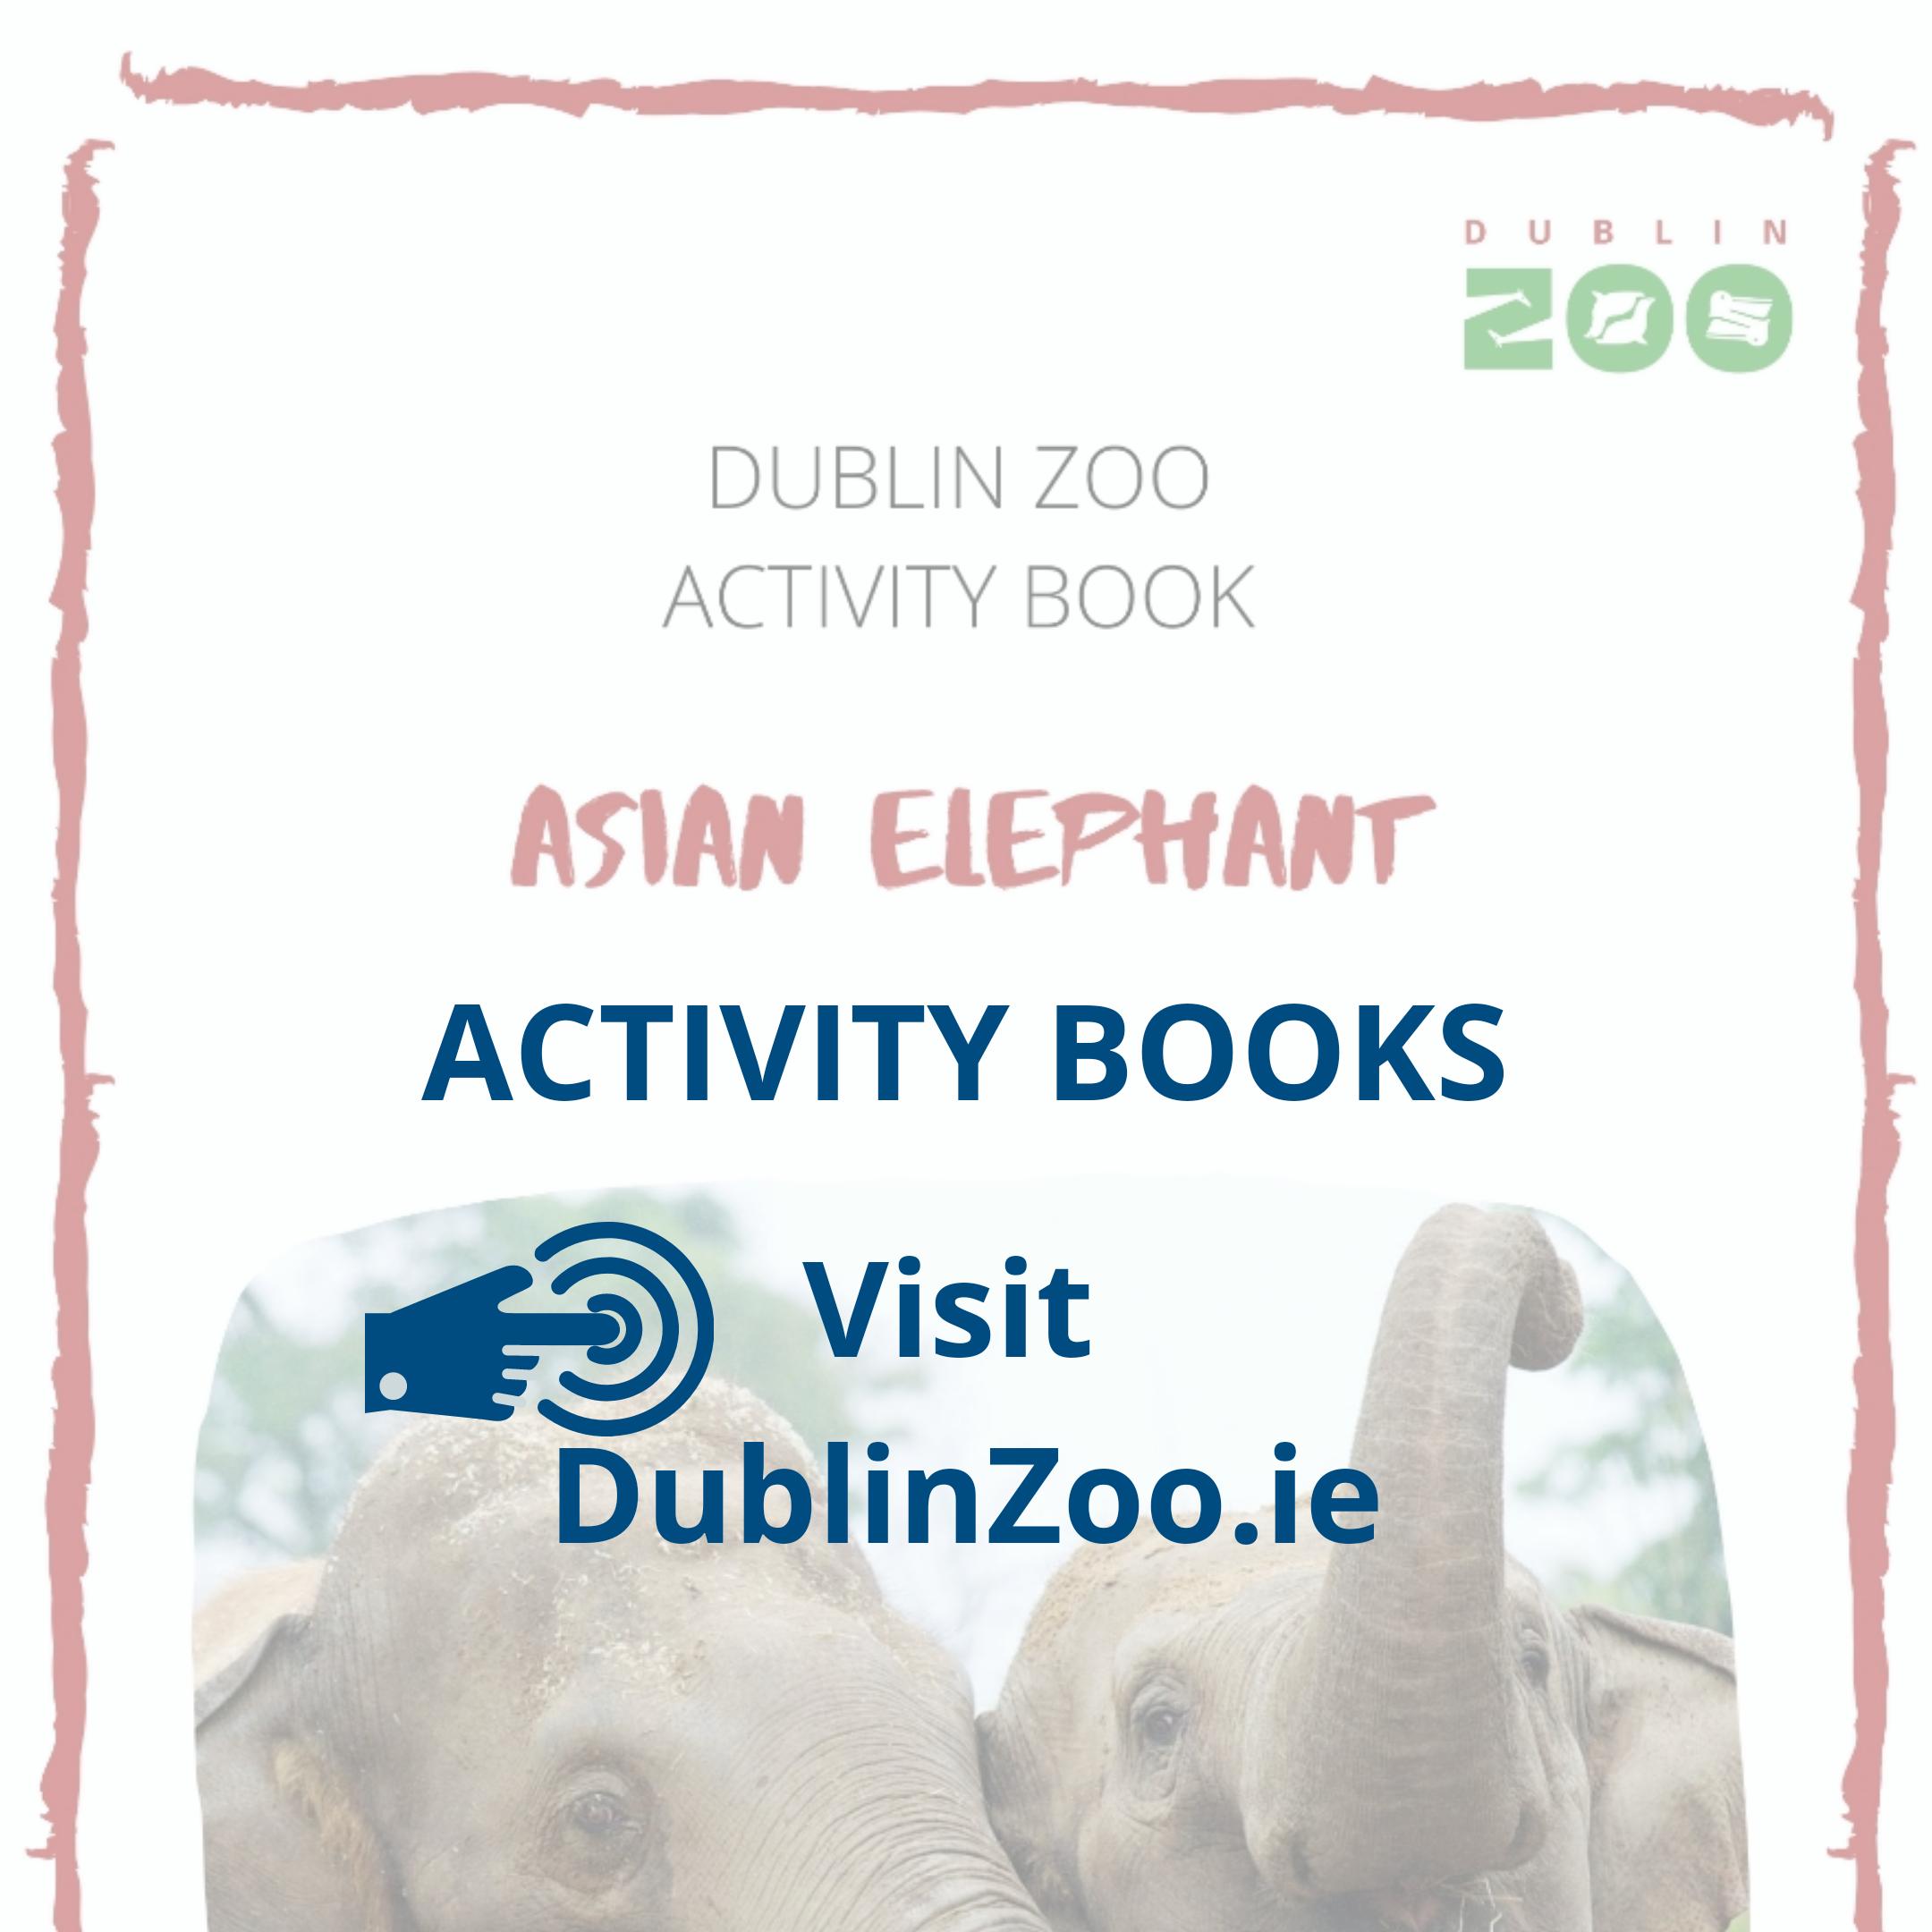 Dublin Zoo Activity Books